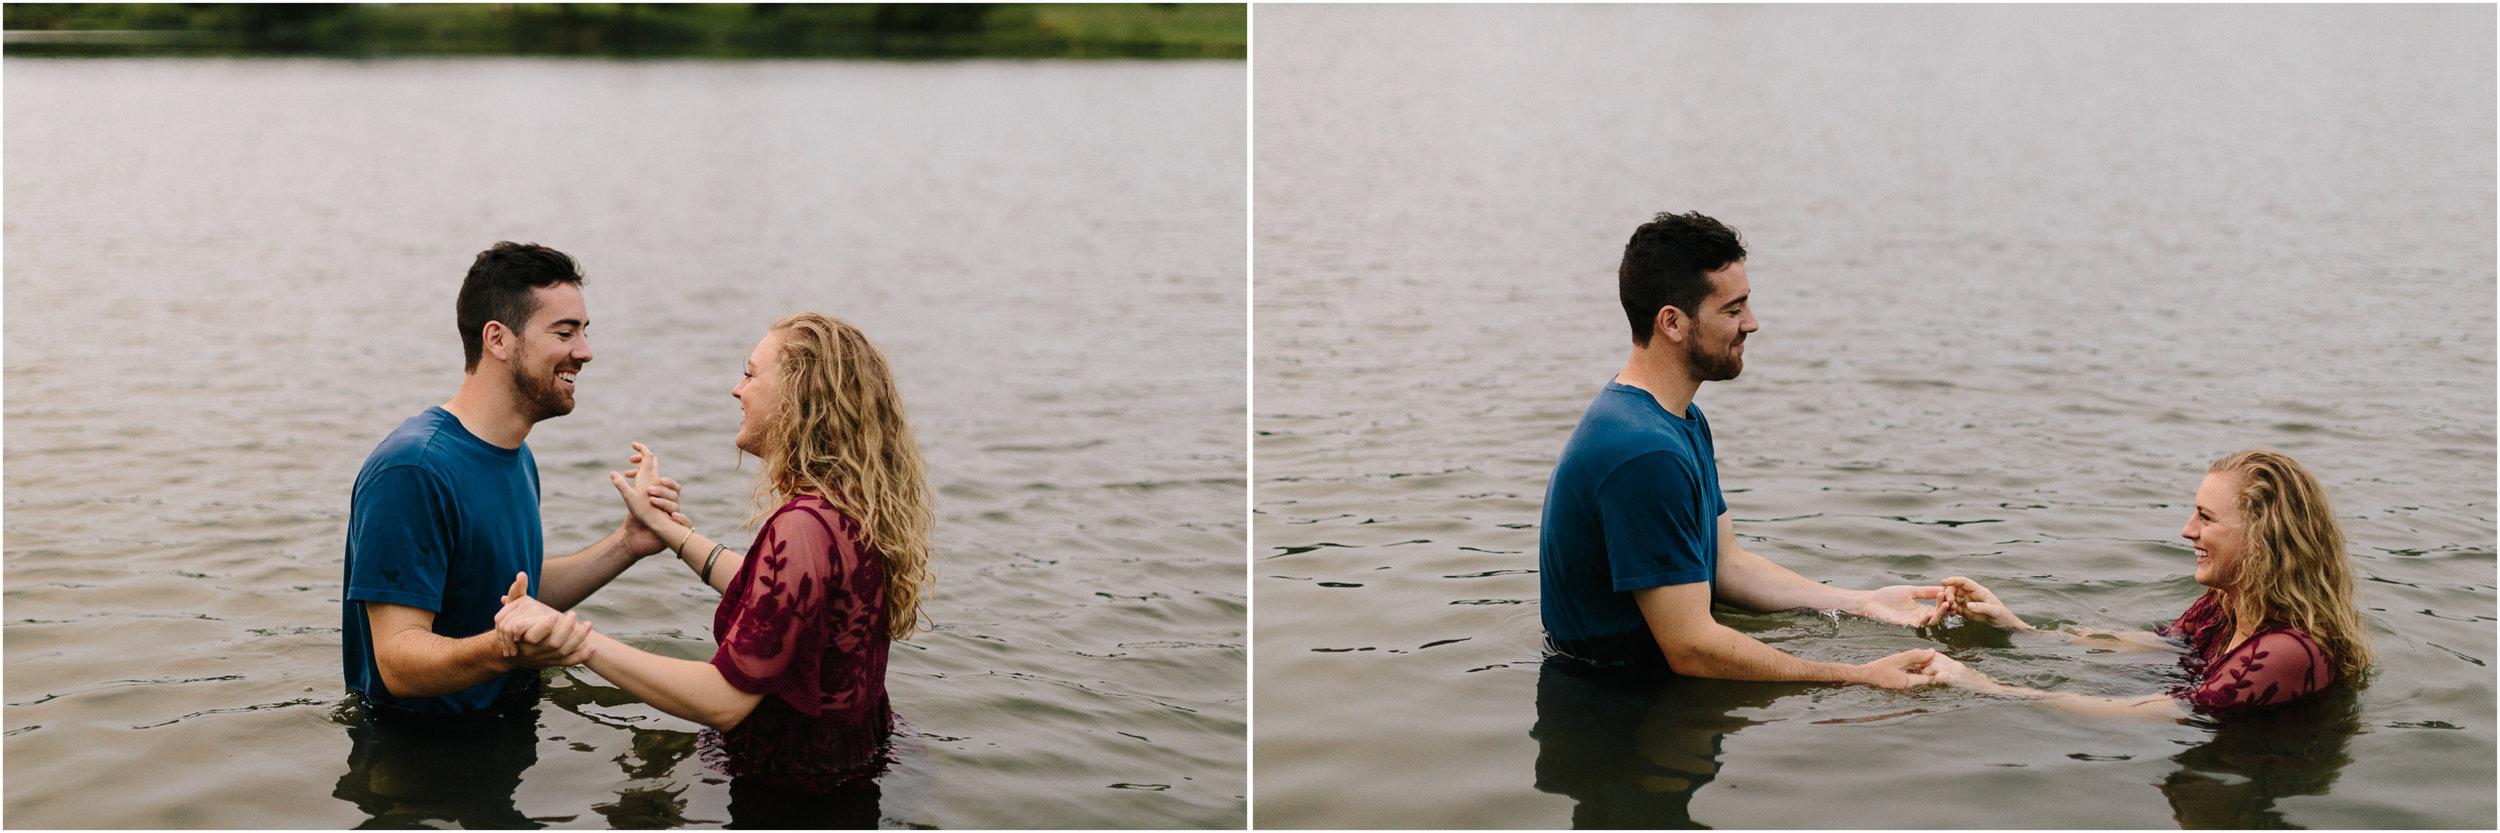 alyssa barletter photography shawnee mission lake photos-22.jpg